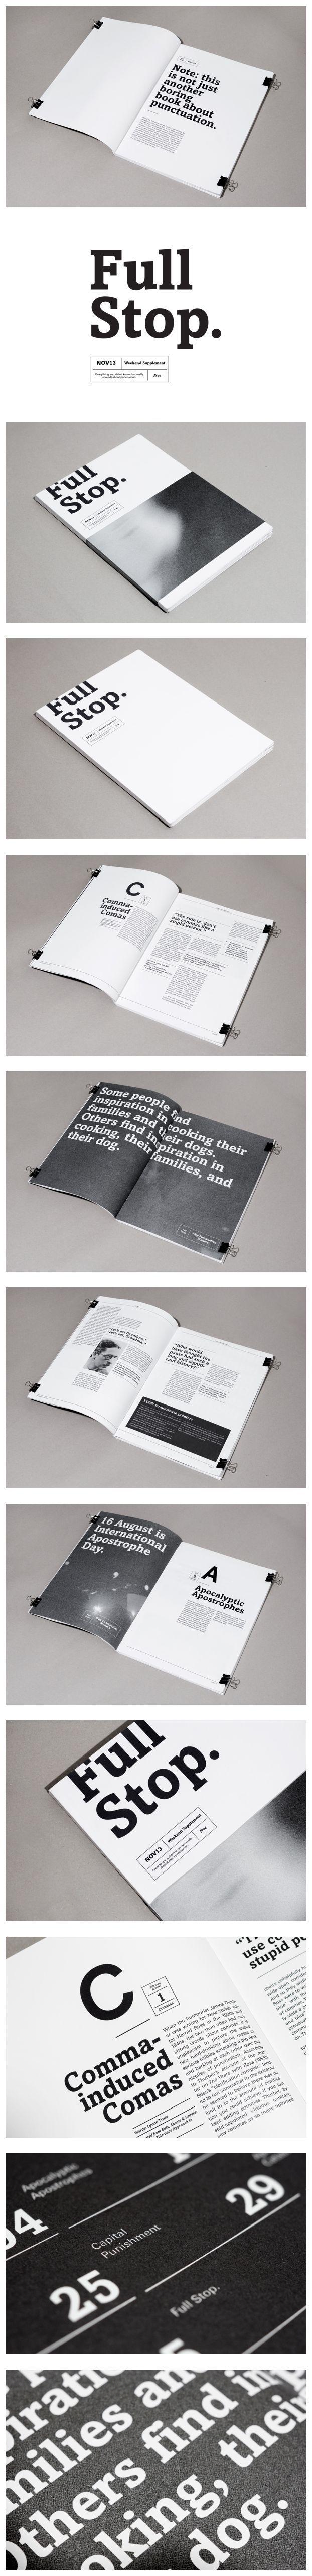 Editorial Design by Sidney Lim